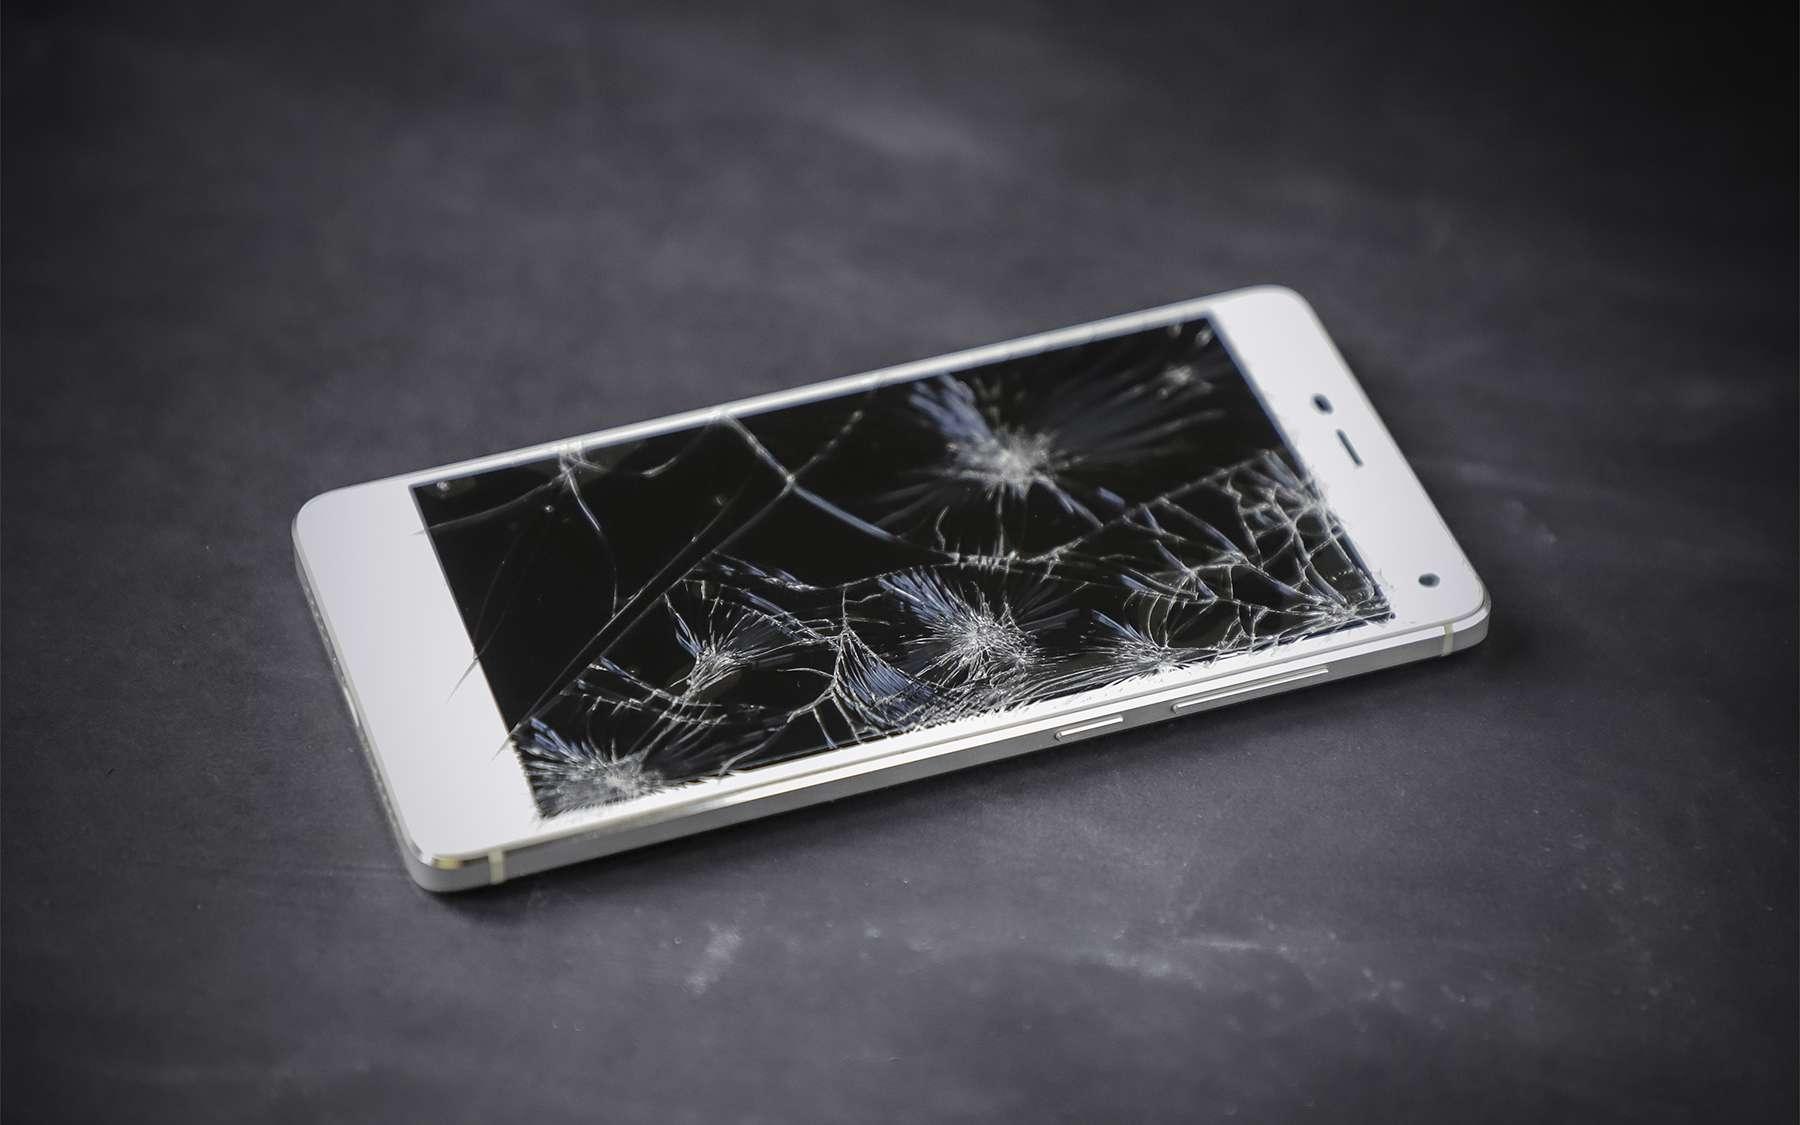 Un smartphone à l'écran brisé. © Adobe Stock